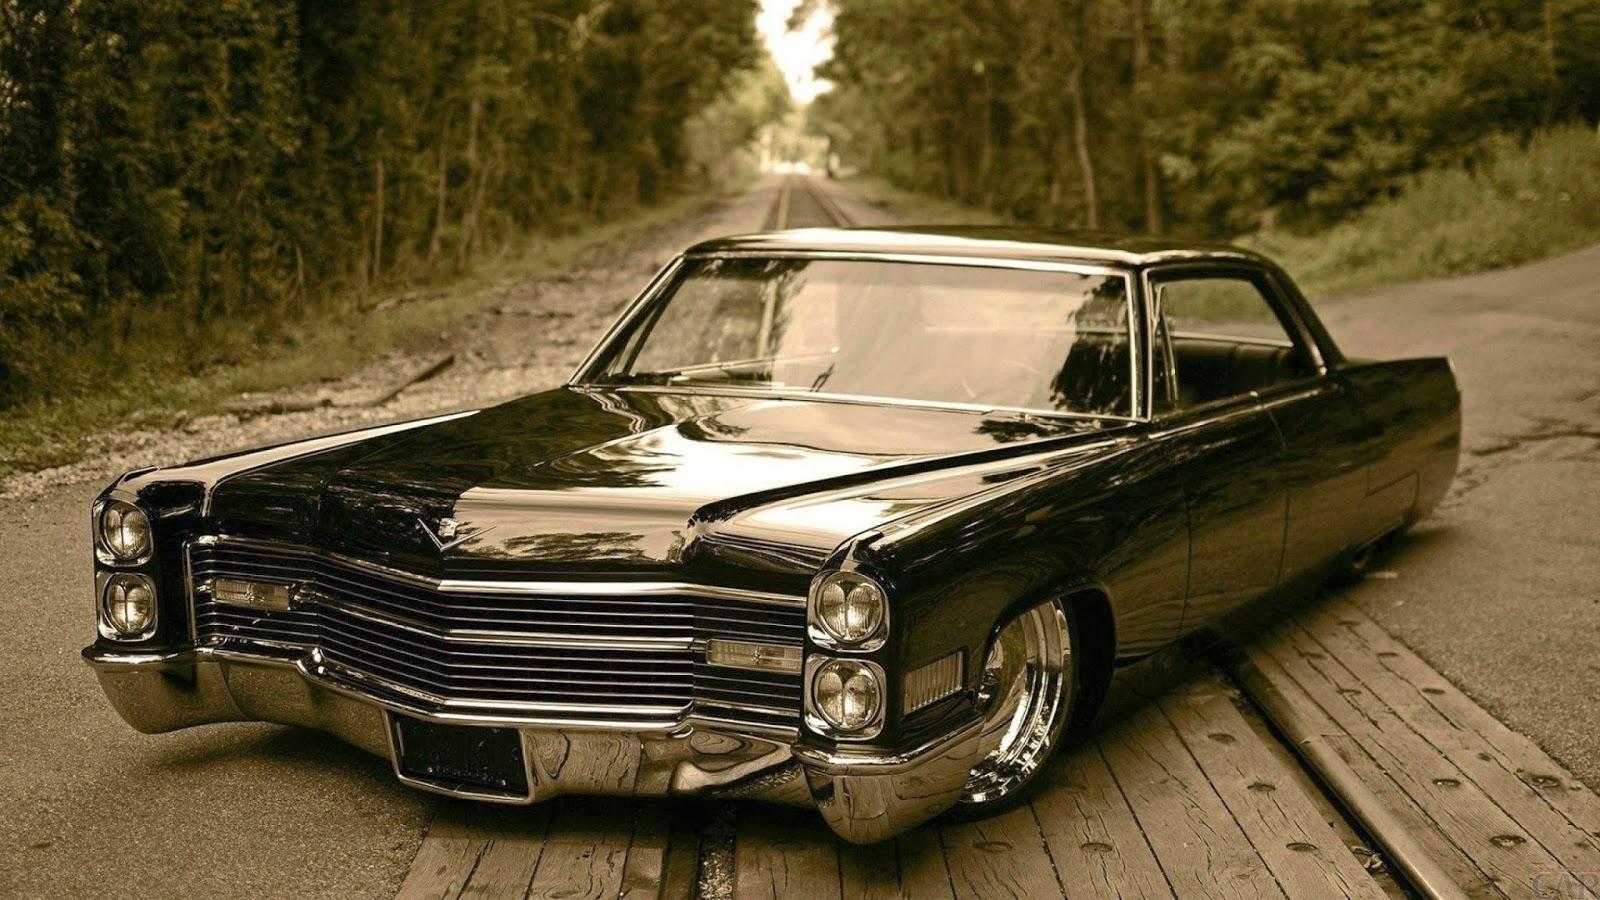 Williamson Cadillac Buick GMC: Wallpaper Wednesday: Three Clic ...